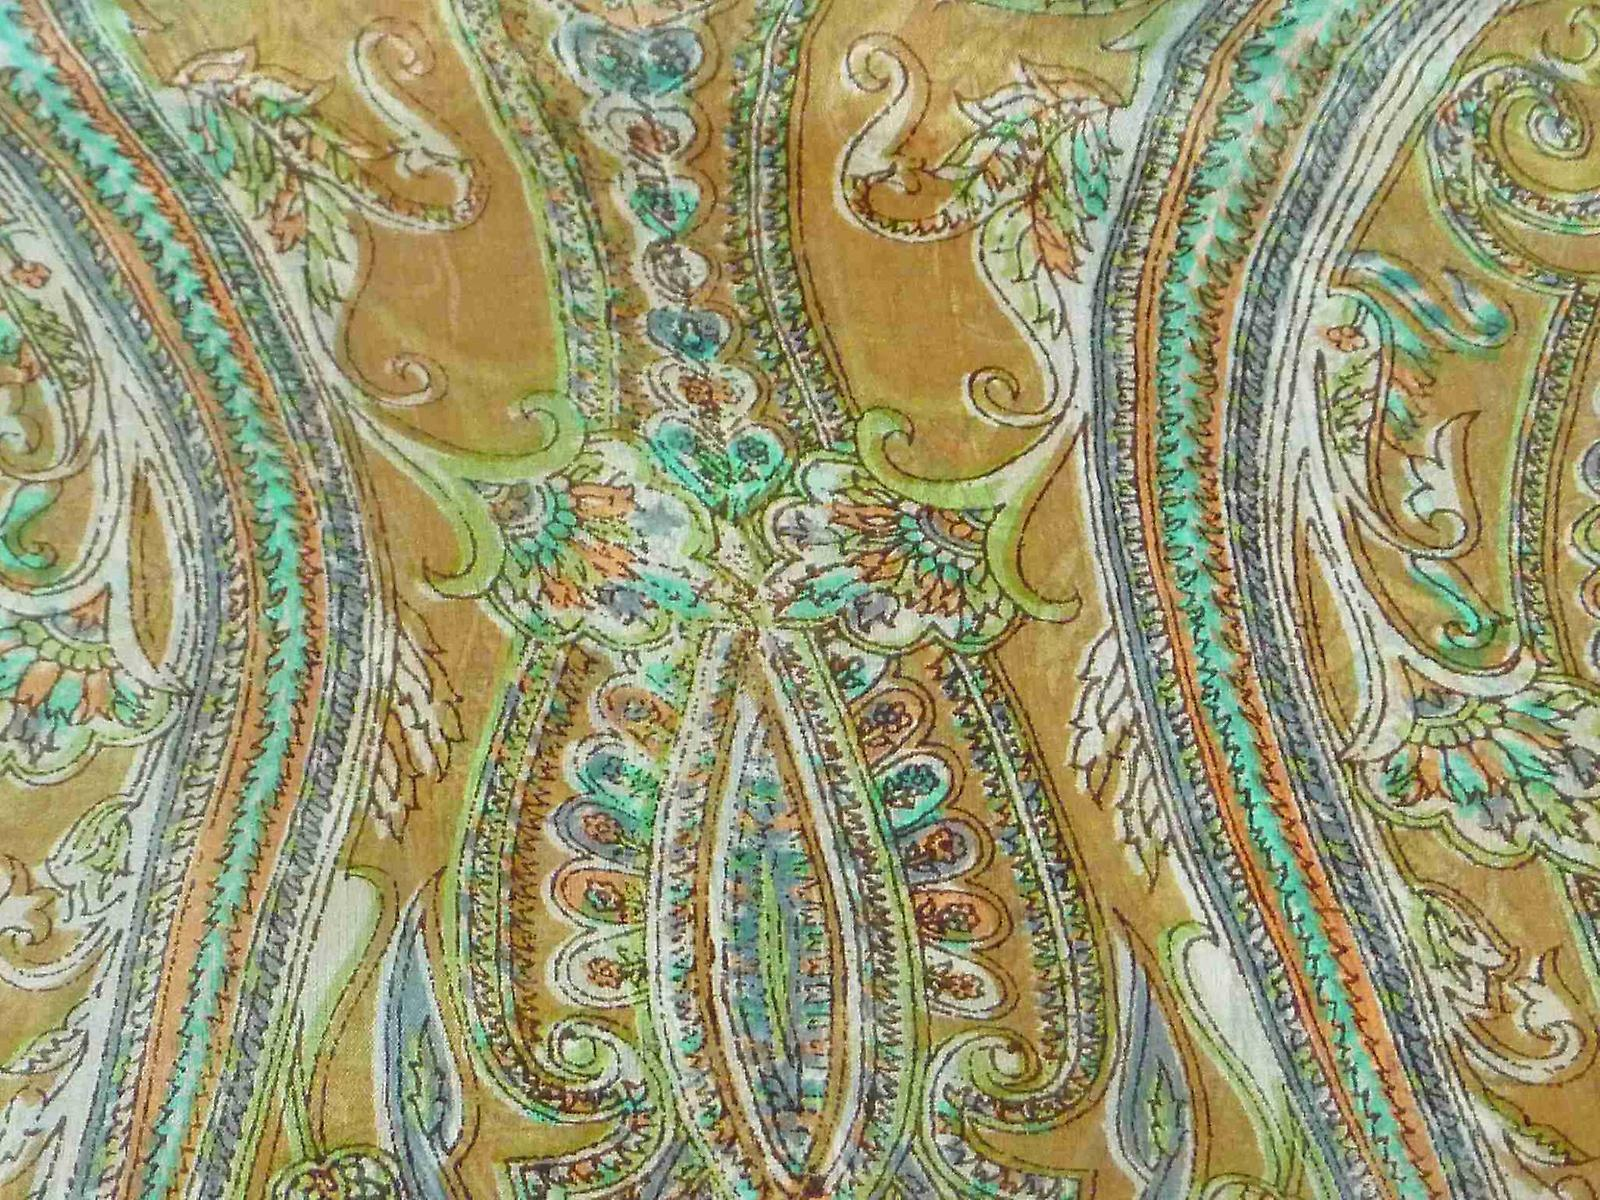 Mulberry Silk Traditional Long Scarf Dana Caramel by Pashmina & Silk